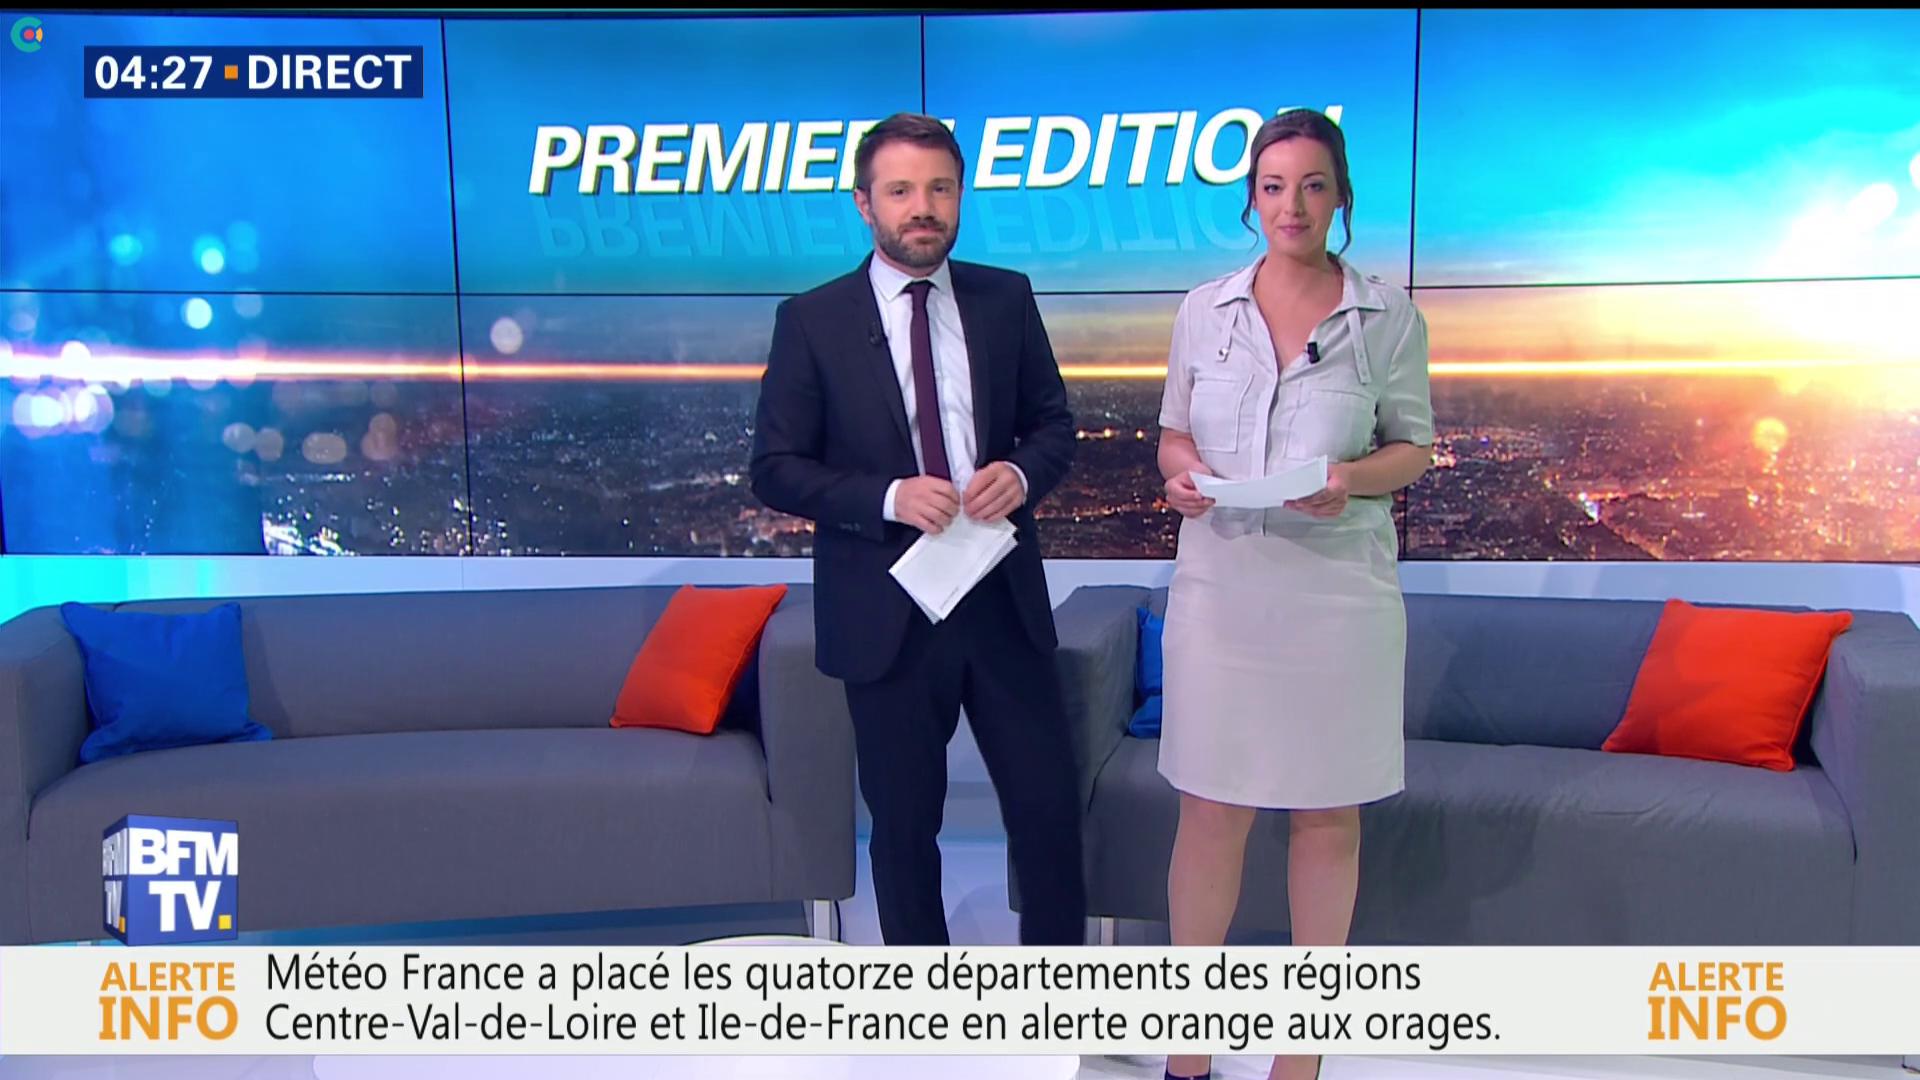 carolinedieudonne00.2017_07_10_premiereeditionBFMTV